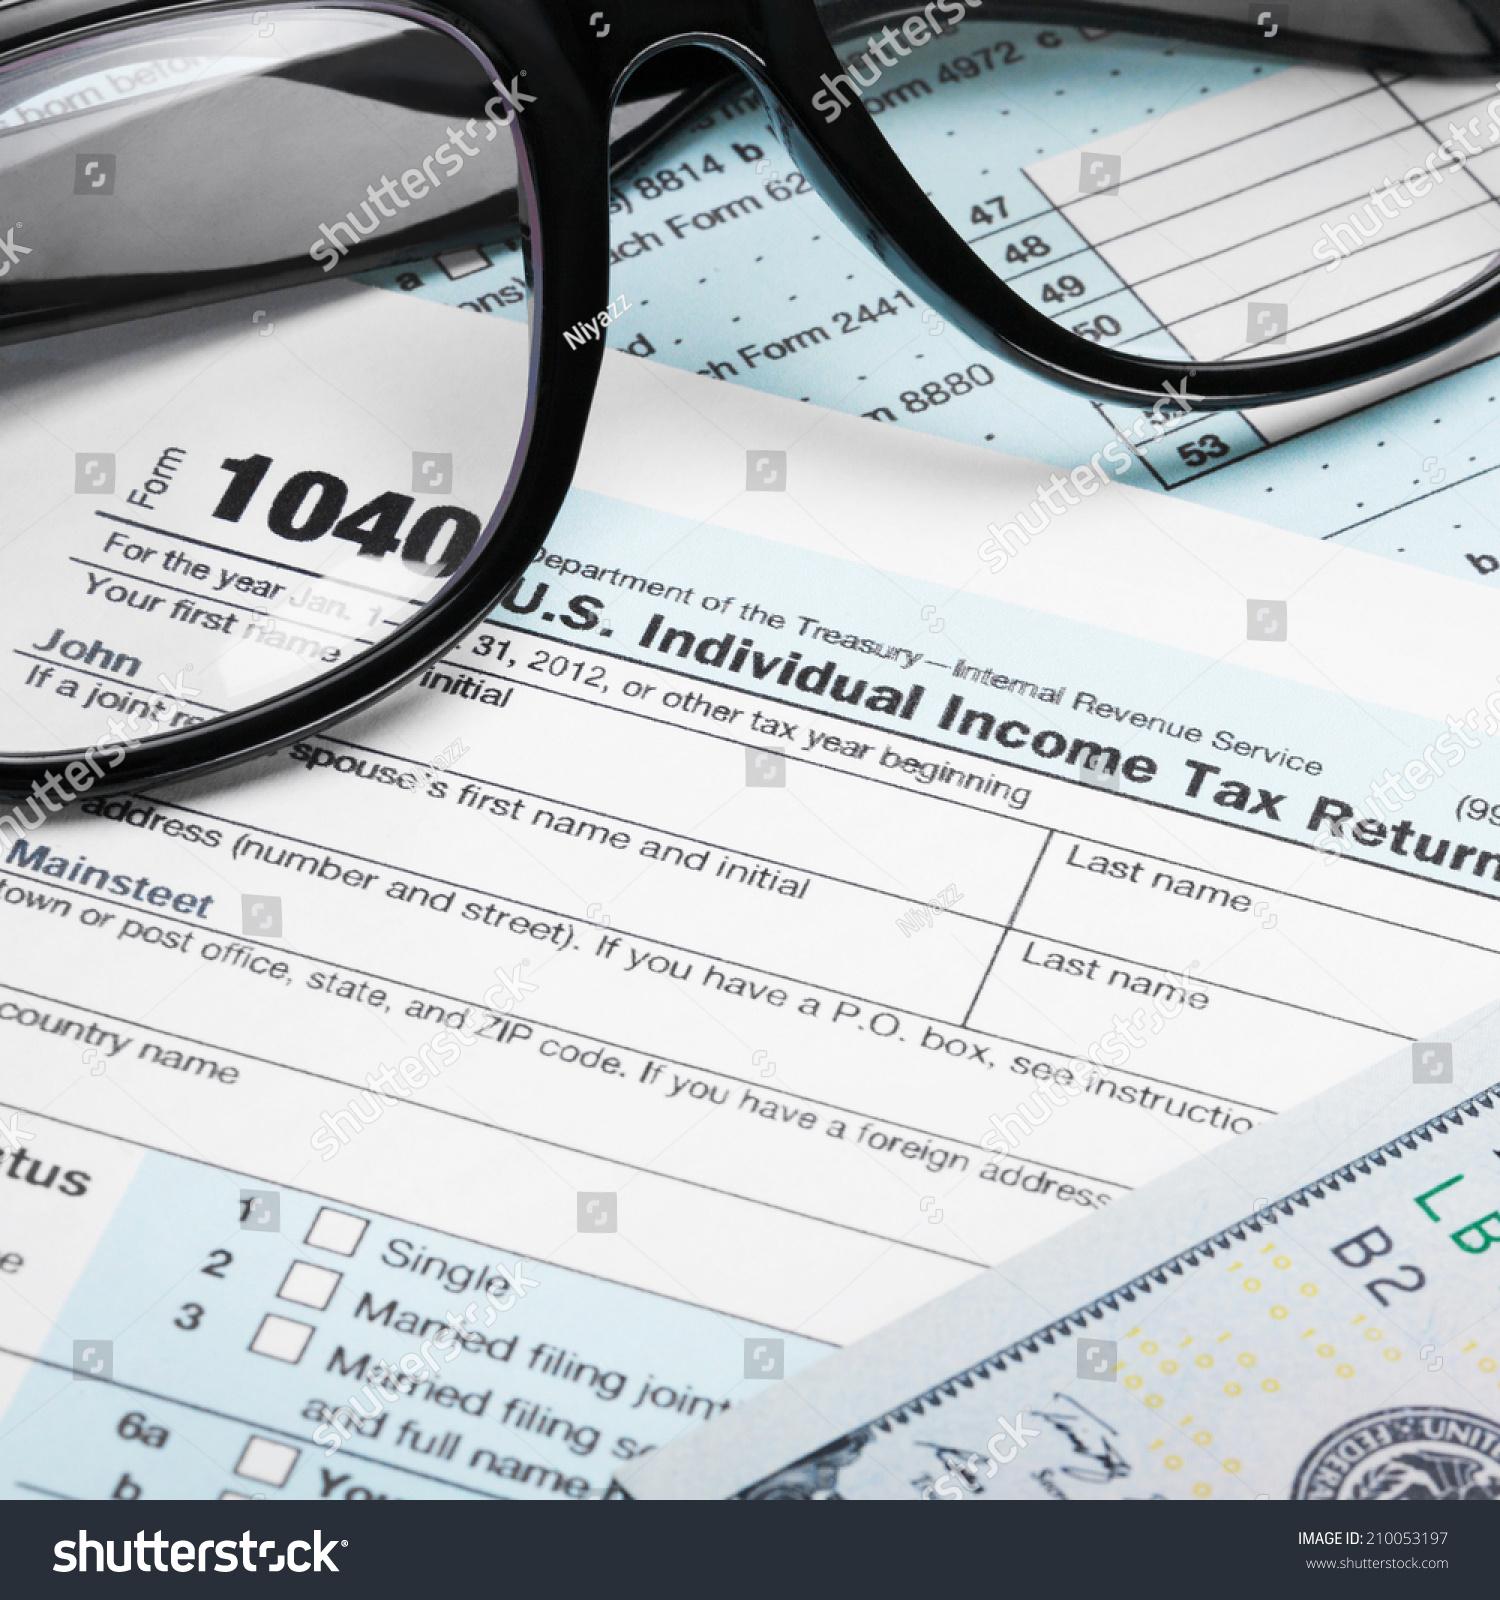 Preparing Taxes - Form 1040 for 2008   EZ Canvas